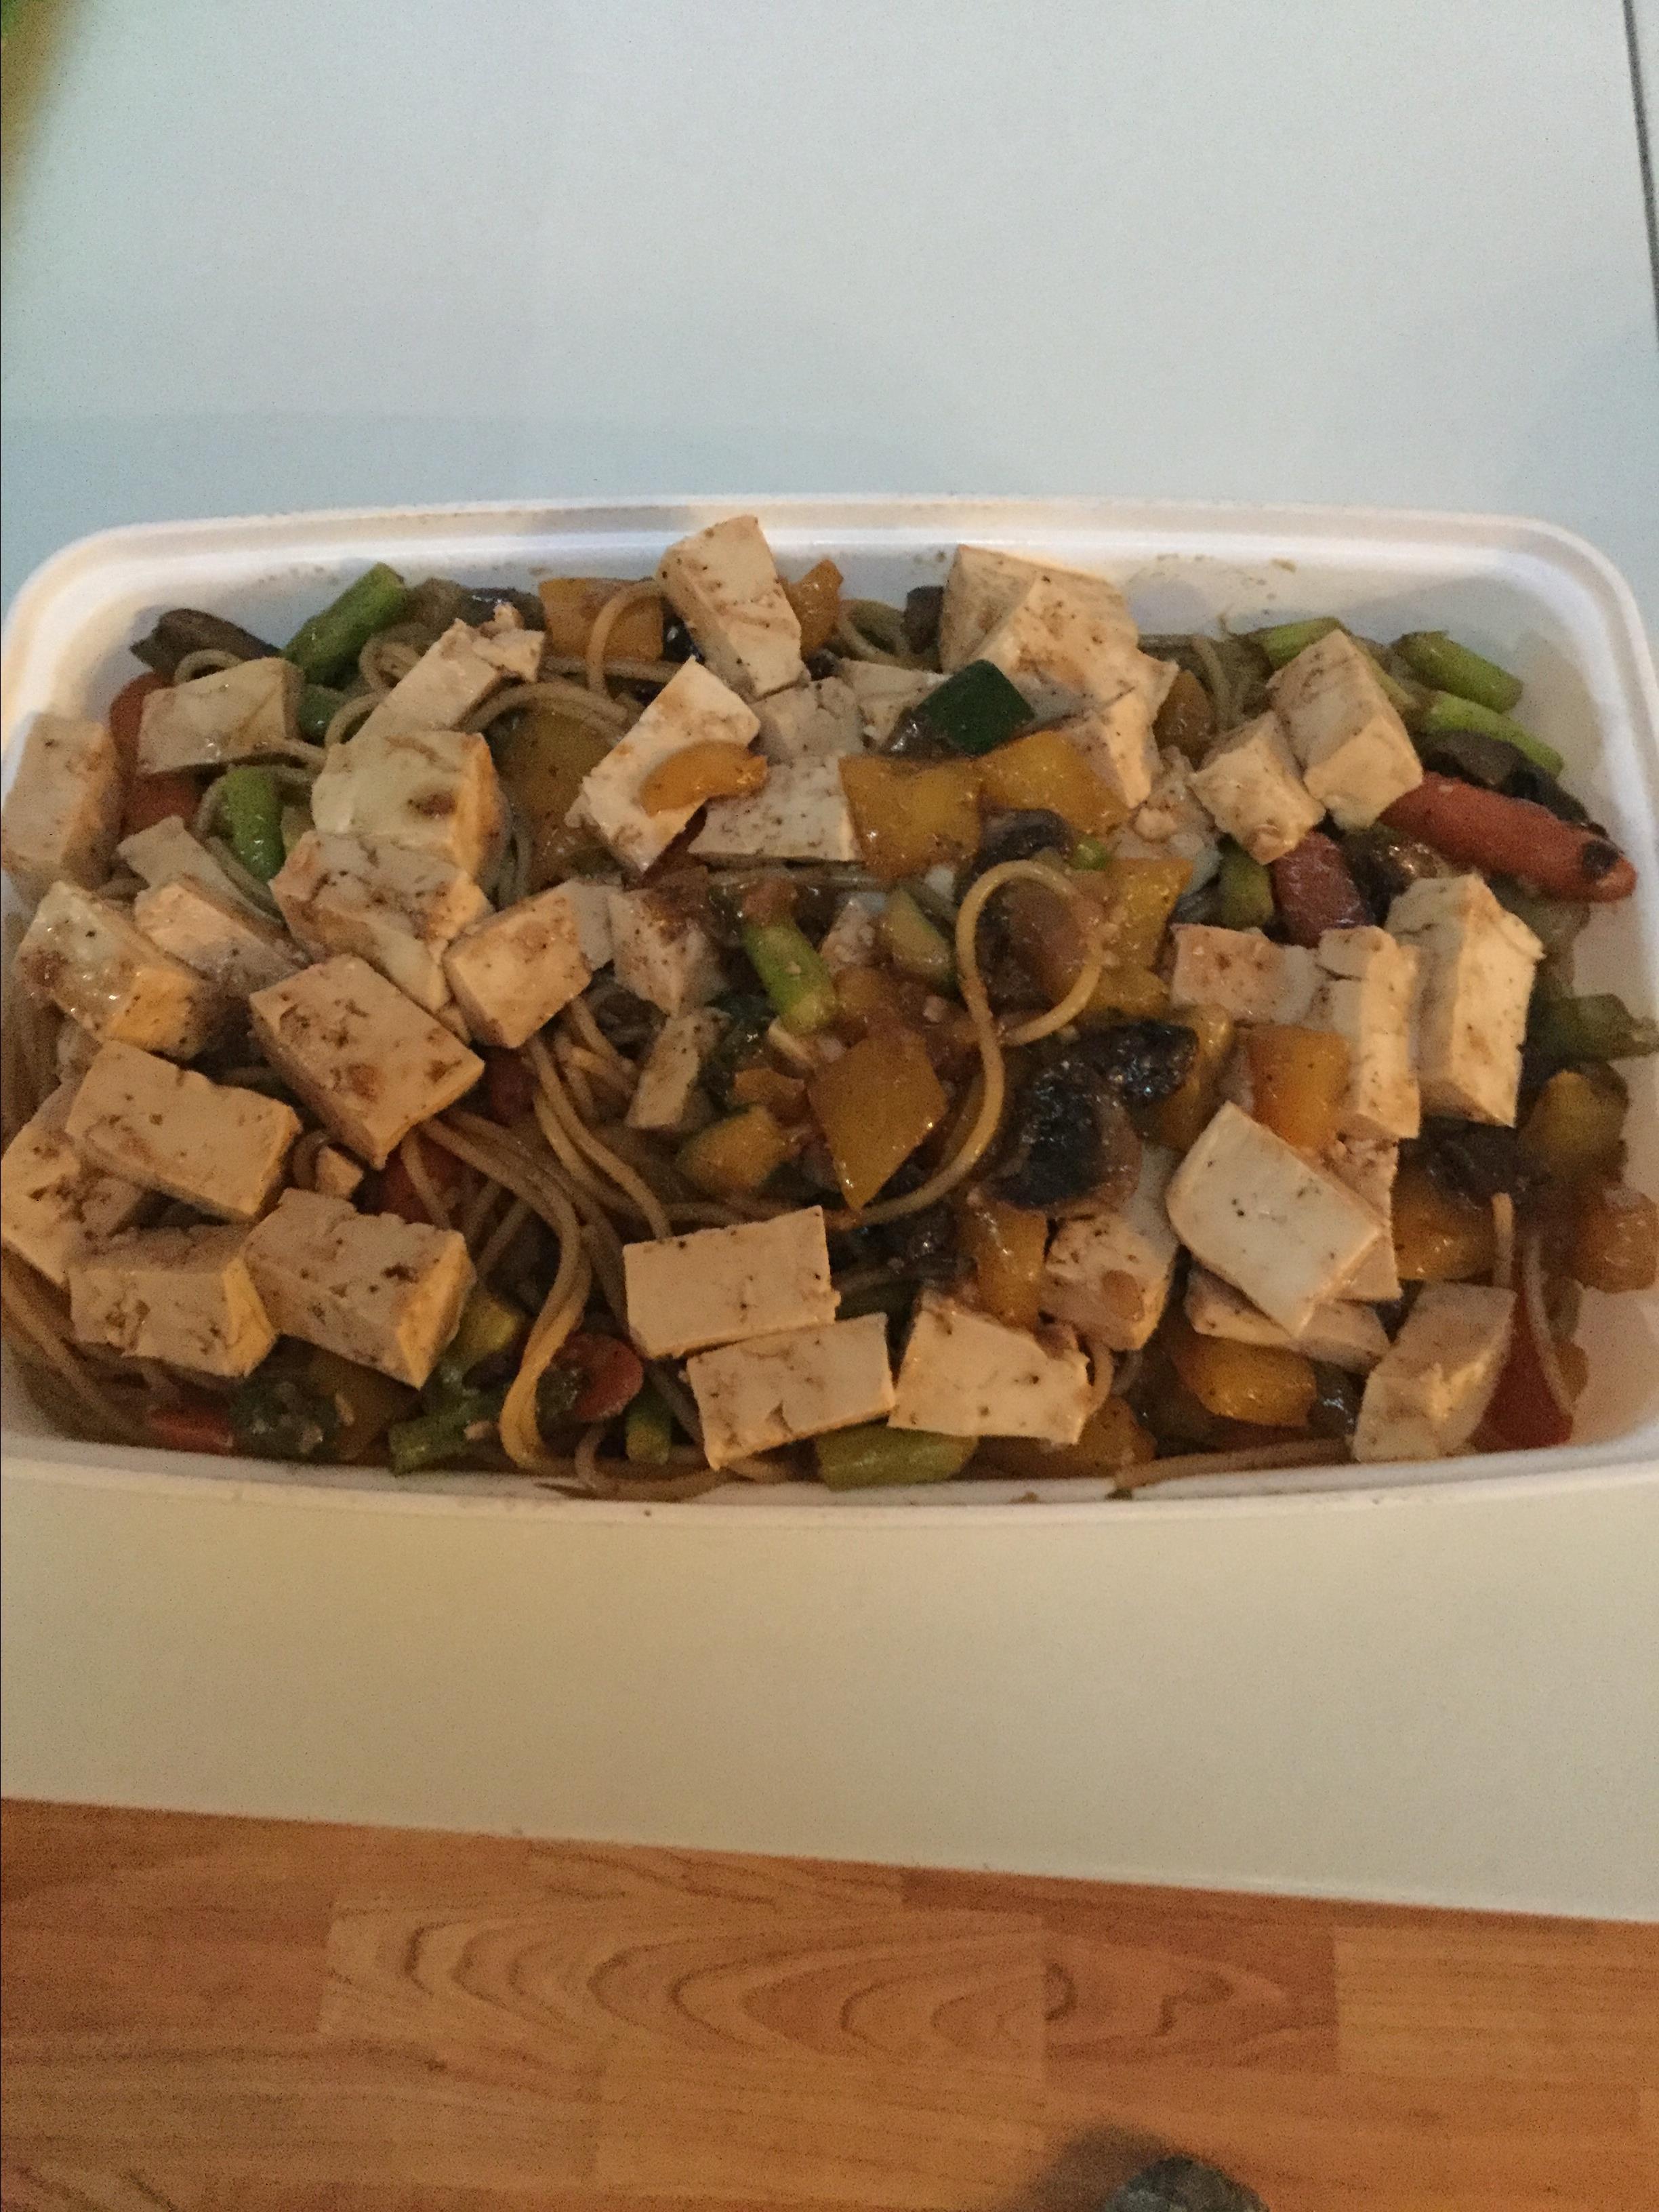 Spicy Stir-Fried Udon Noodles